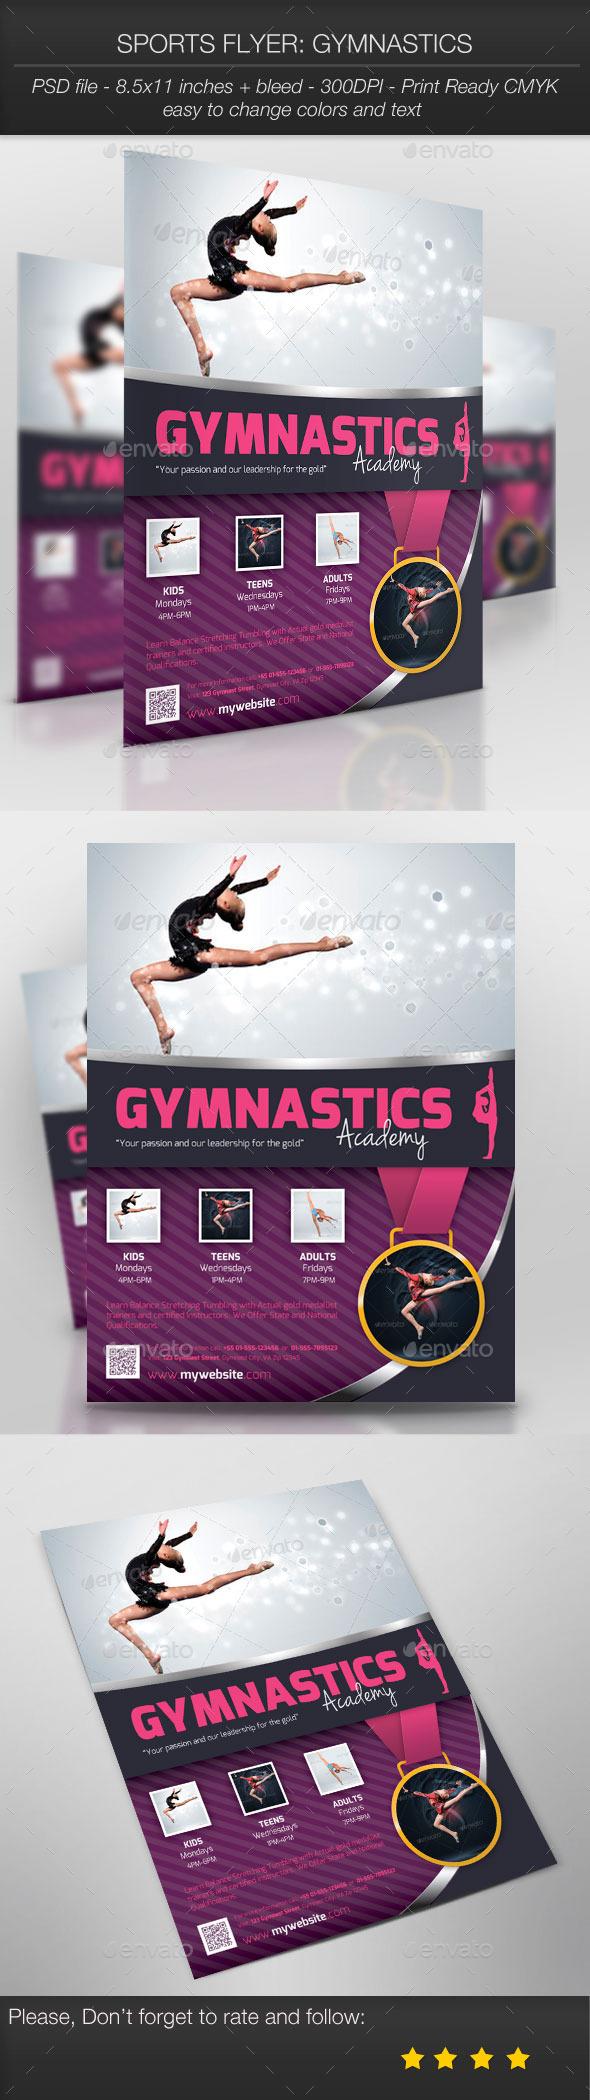 Sports Flyer: Gymnastics - Sports Events